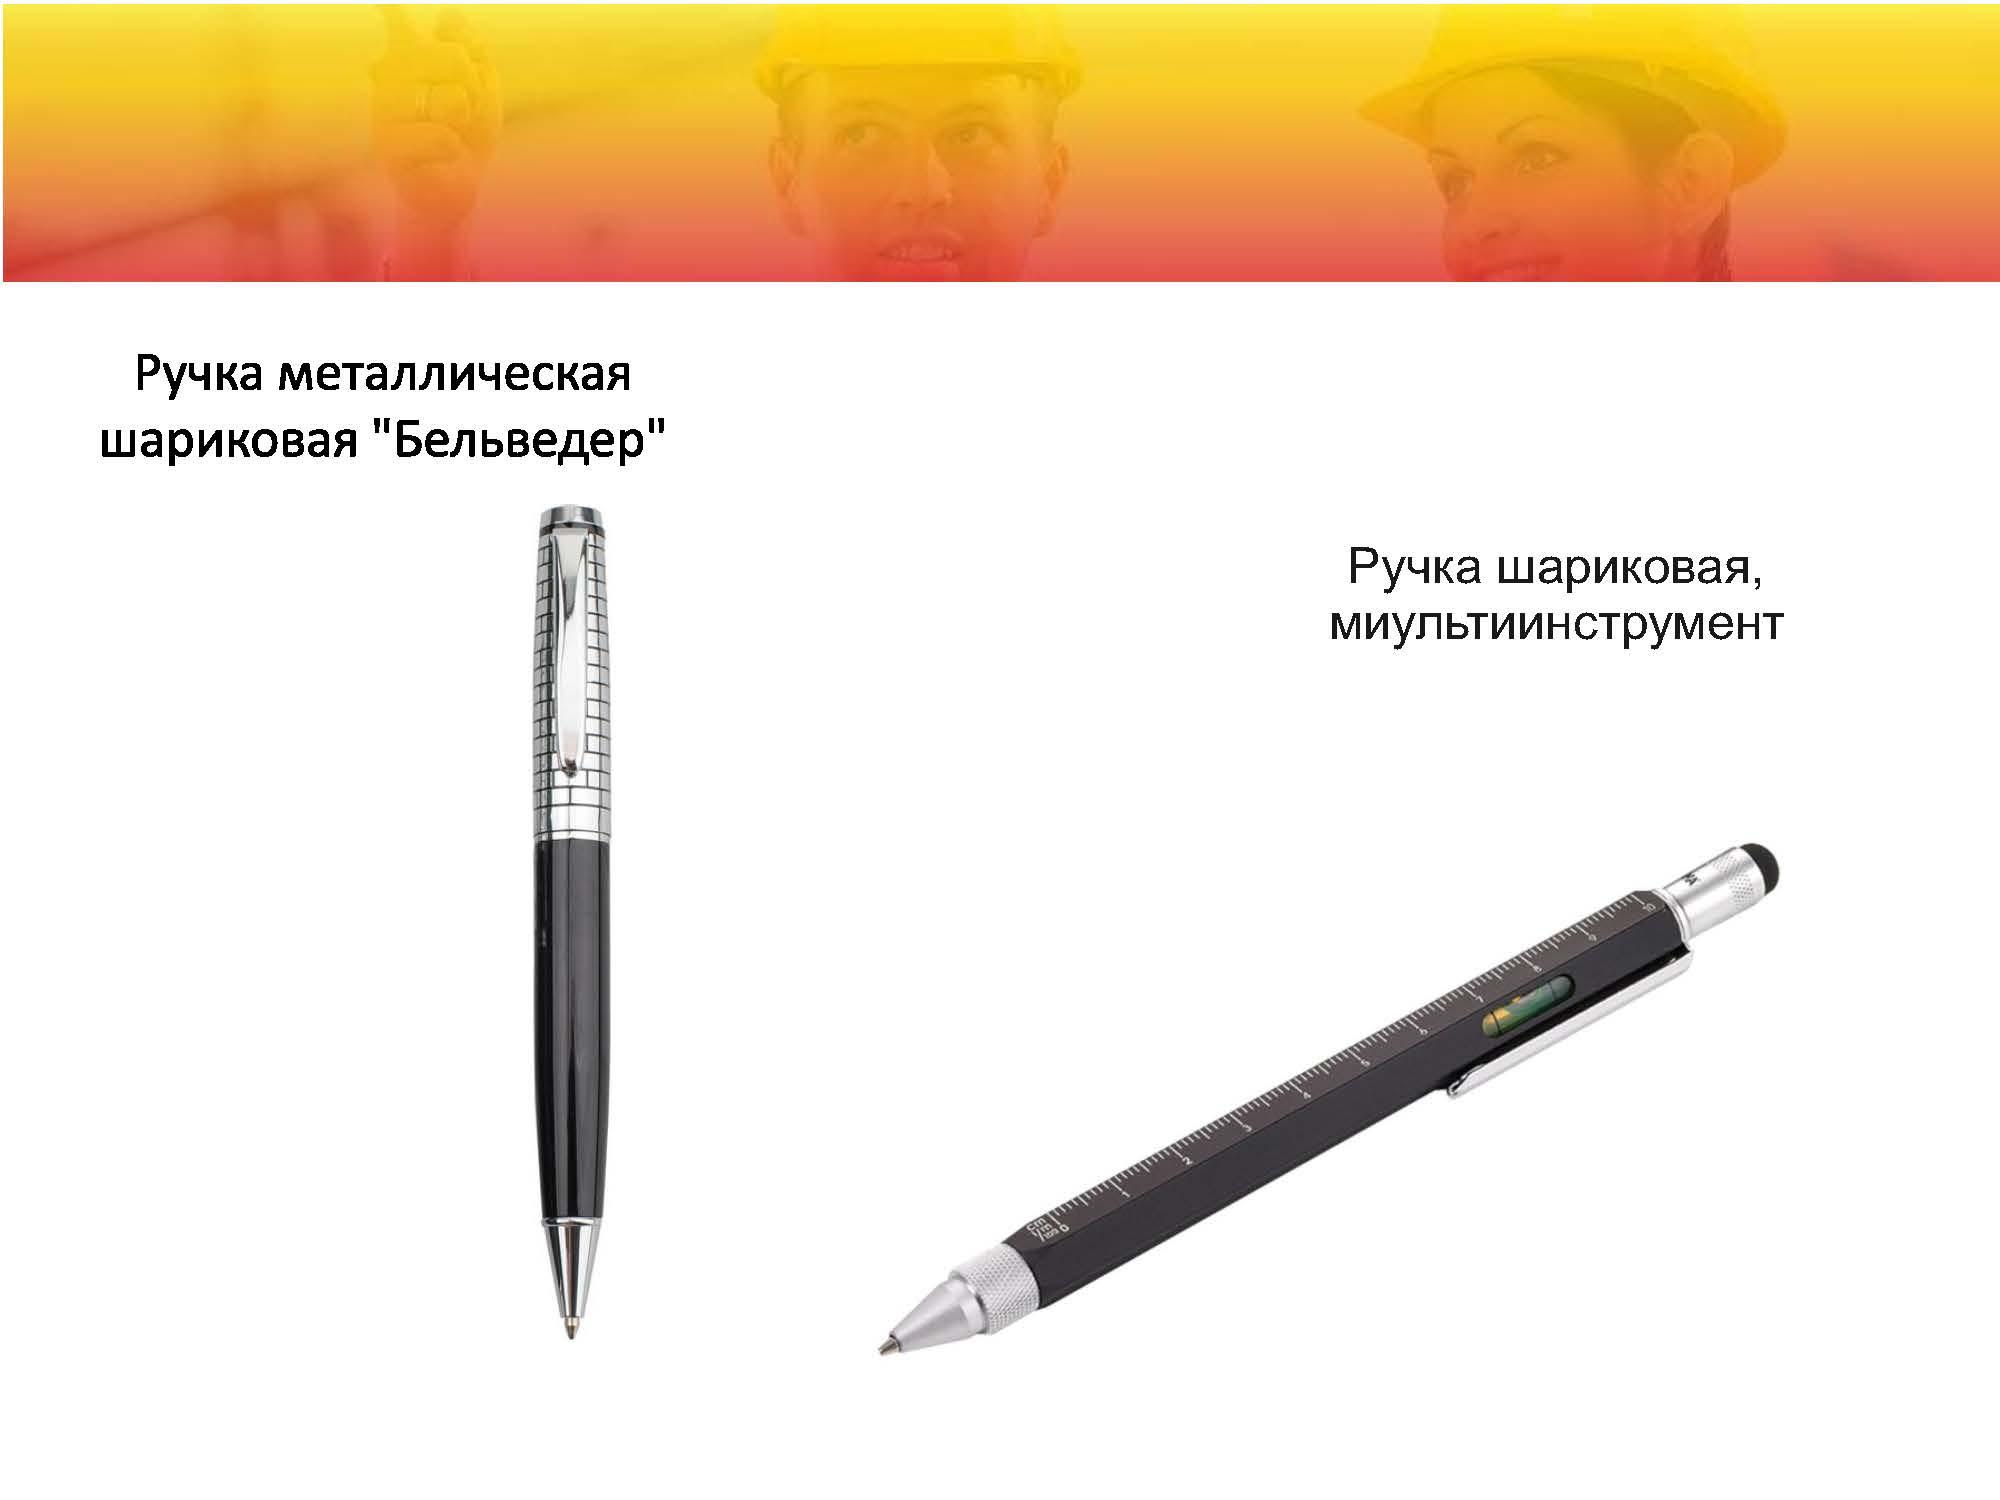 Презентация от PromoPrime  День Строителя_Страница_11